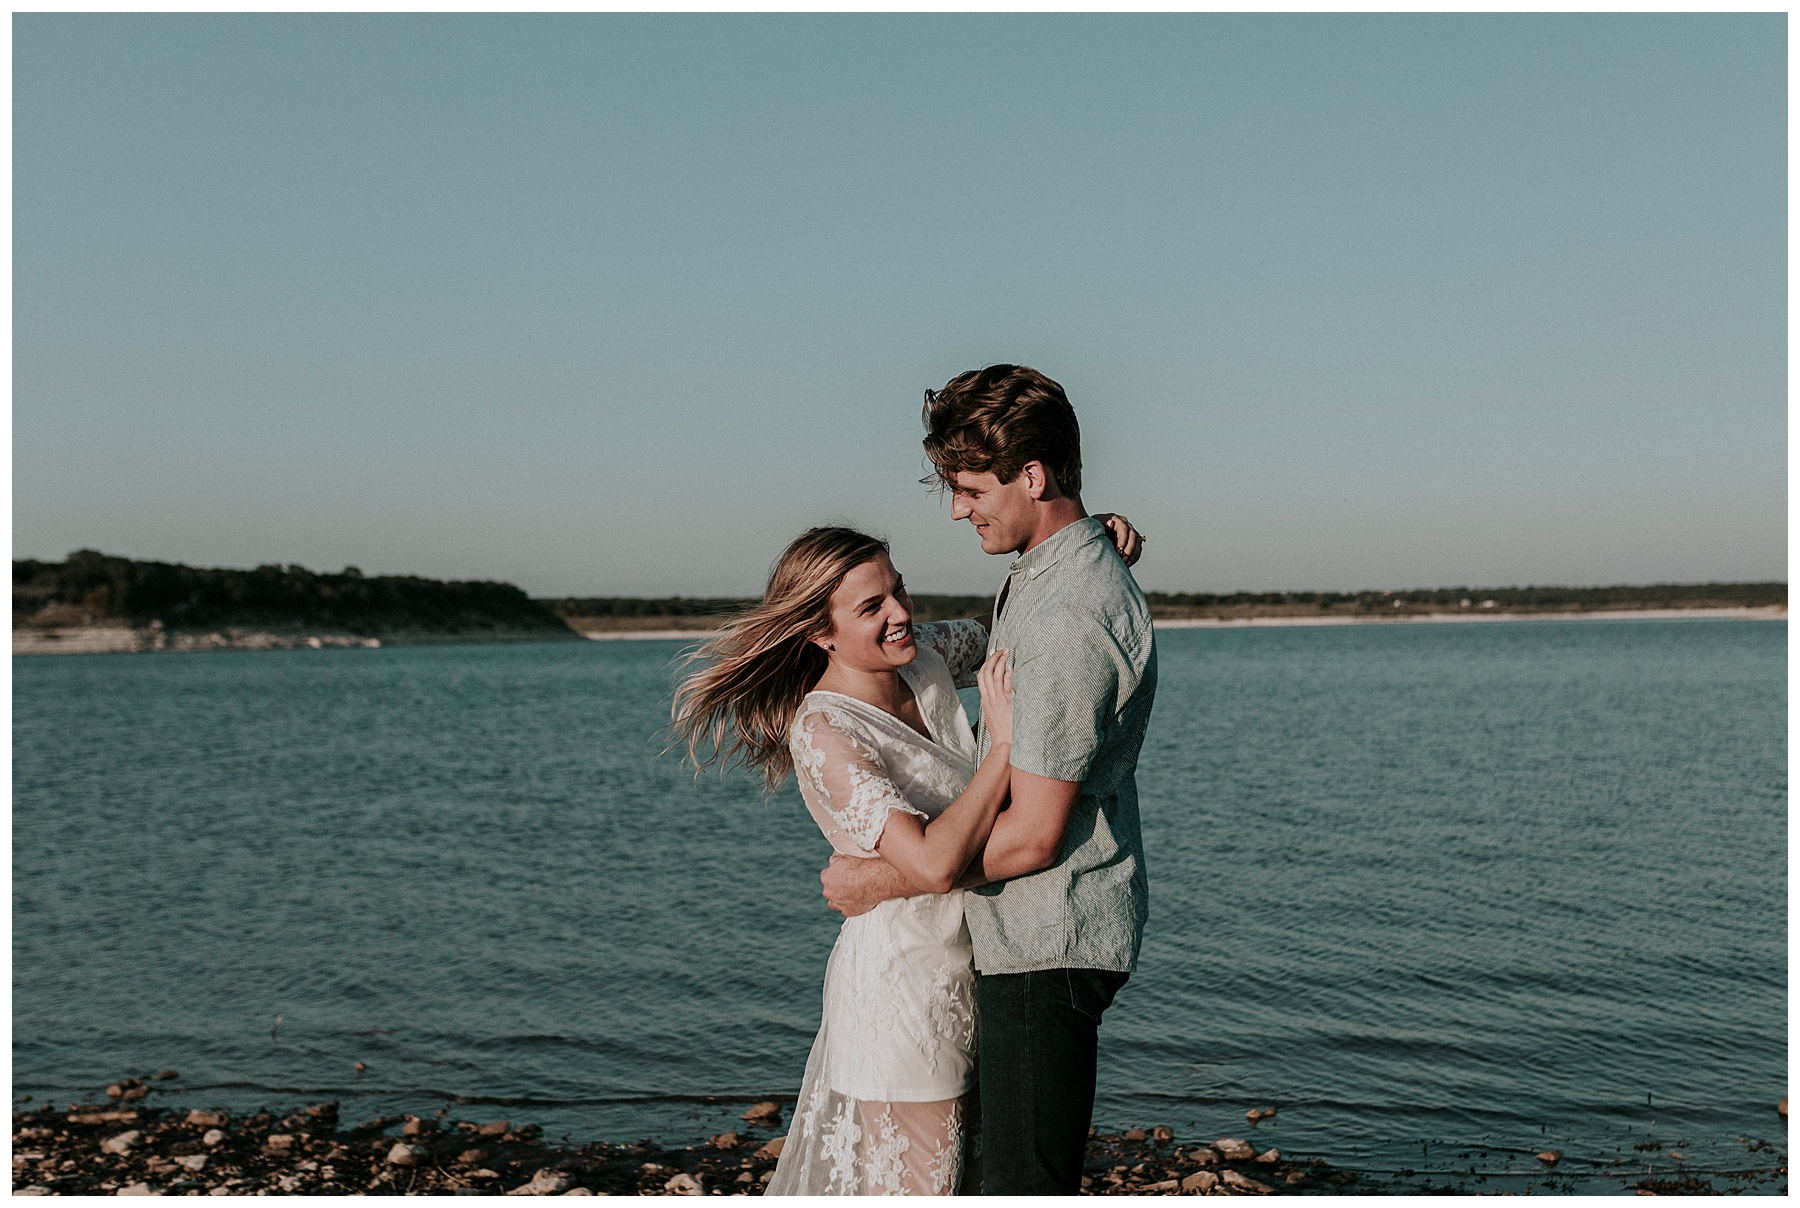 austin-texas-engagement-shoot4519.JPG